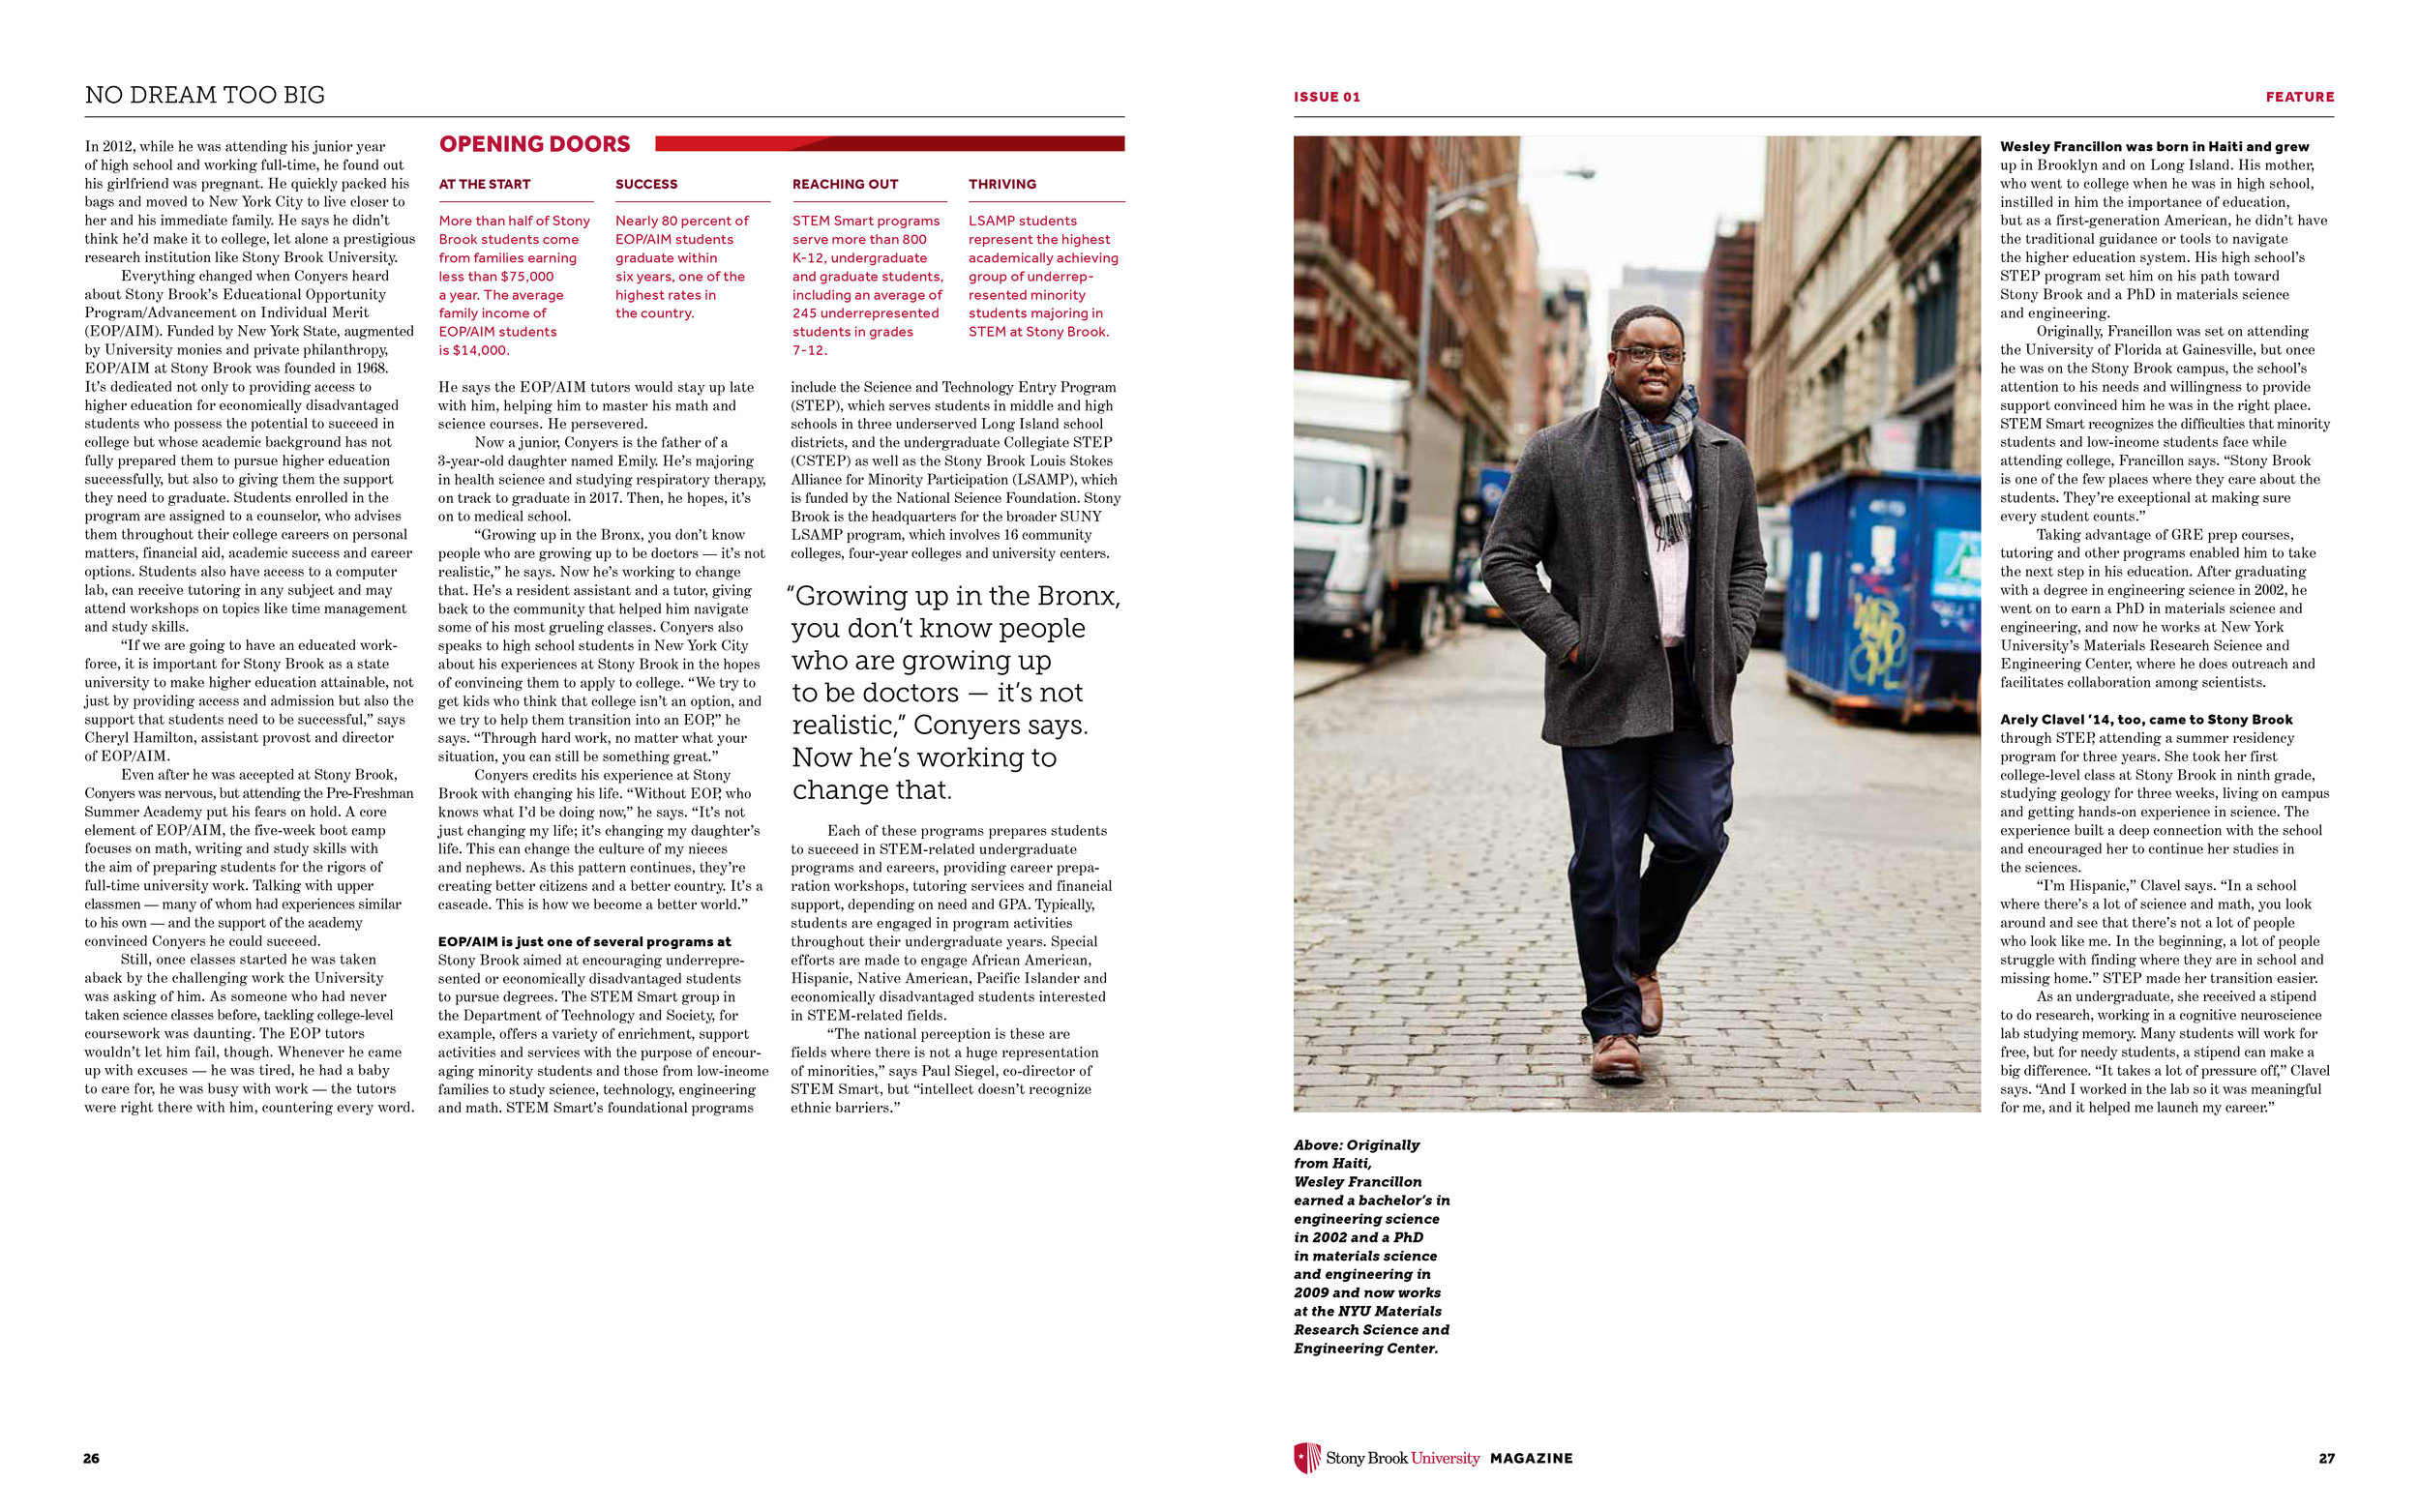 SBU_Magazine_Issue01_Final-15.jpg